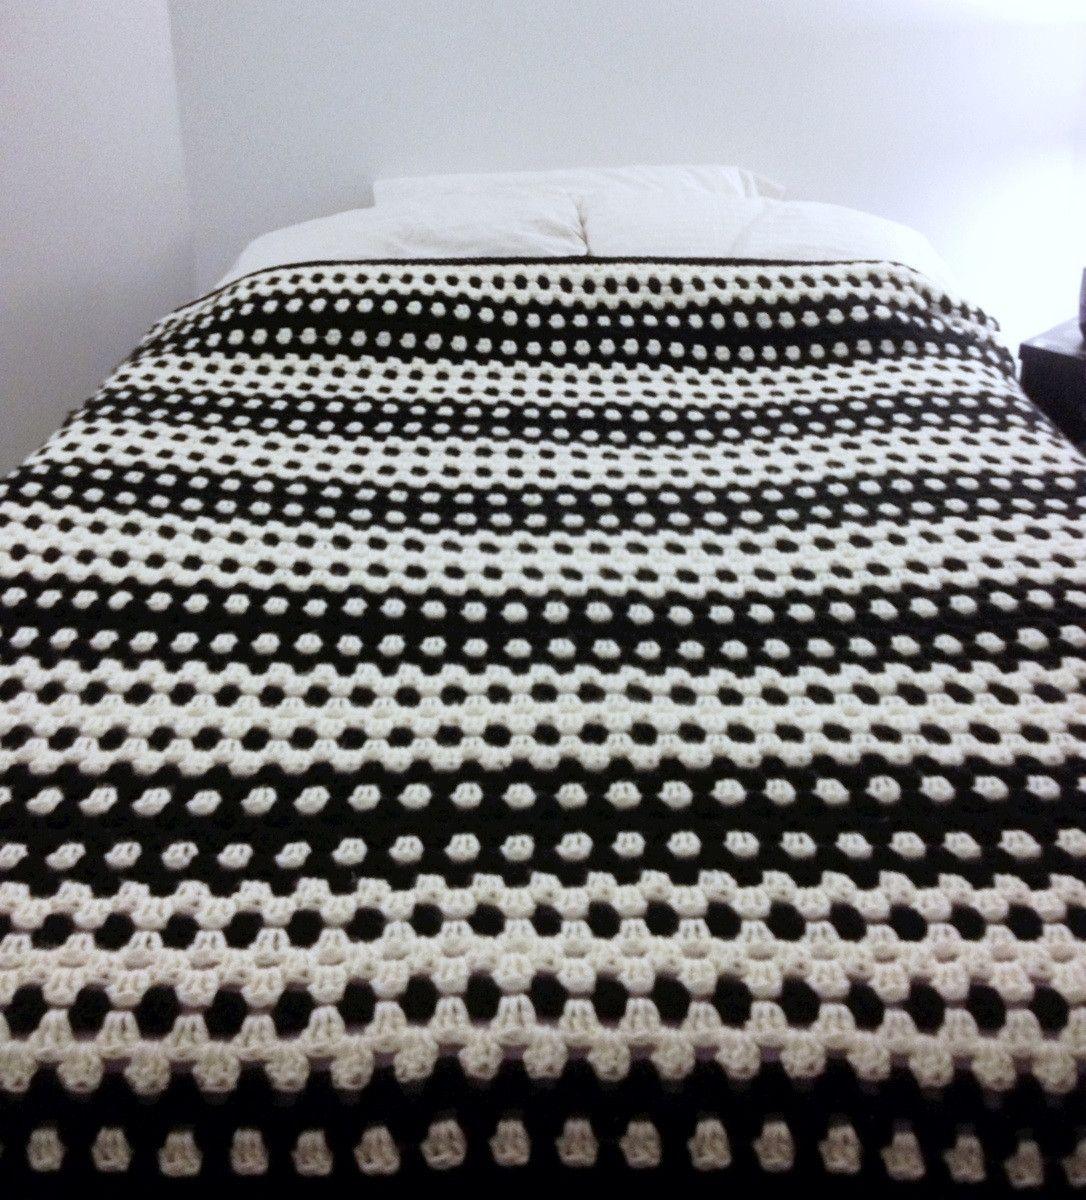 Granny Stripe Blanket 6 5 Hook Held Double Stranded 2 Rows White 1 Row Black Granny Stripe Blanket Striped Crochet Blanket Crochet Blanket Patterns